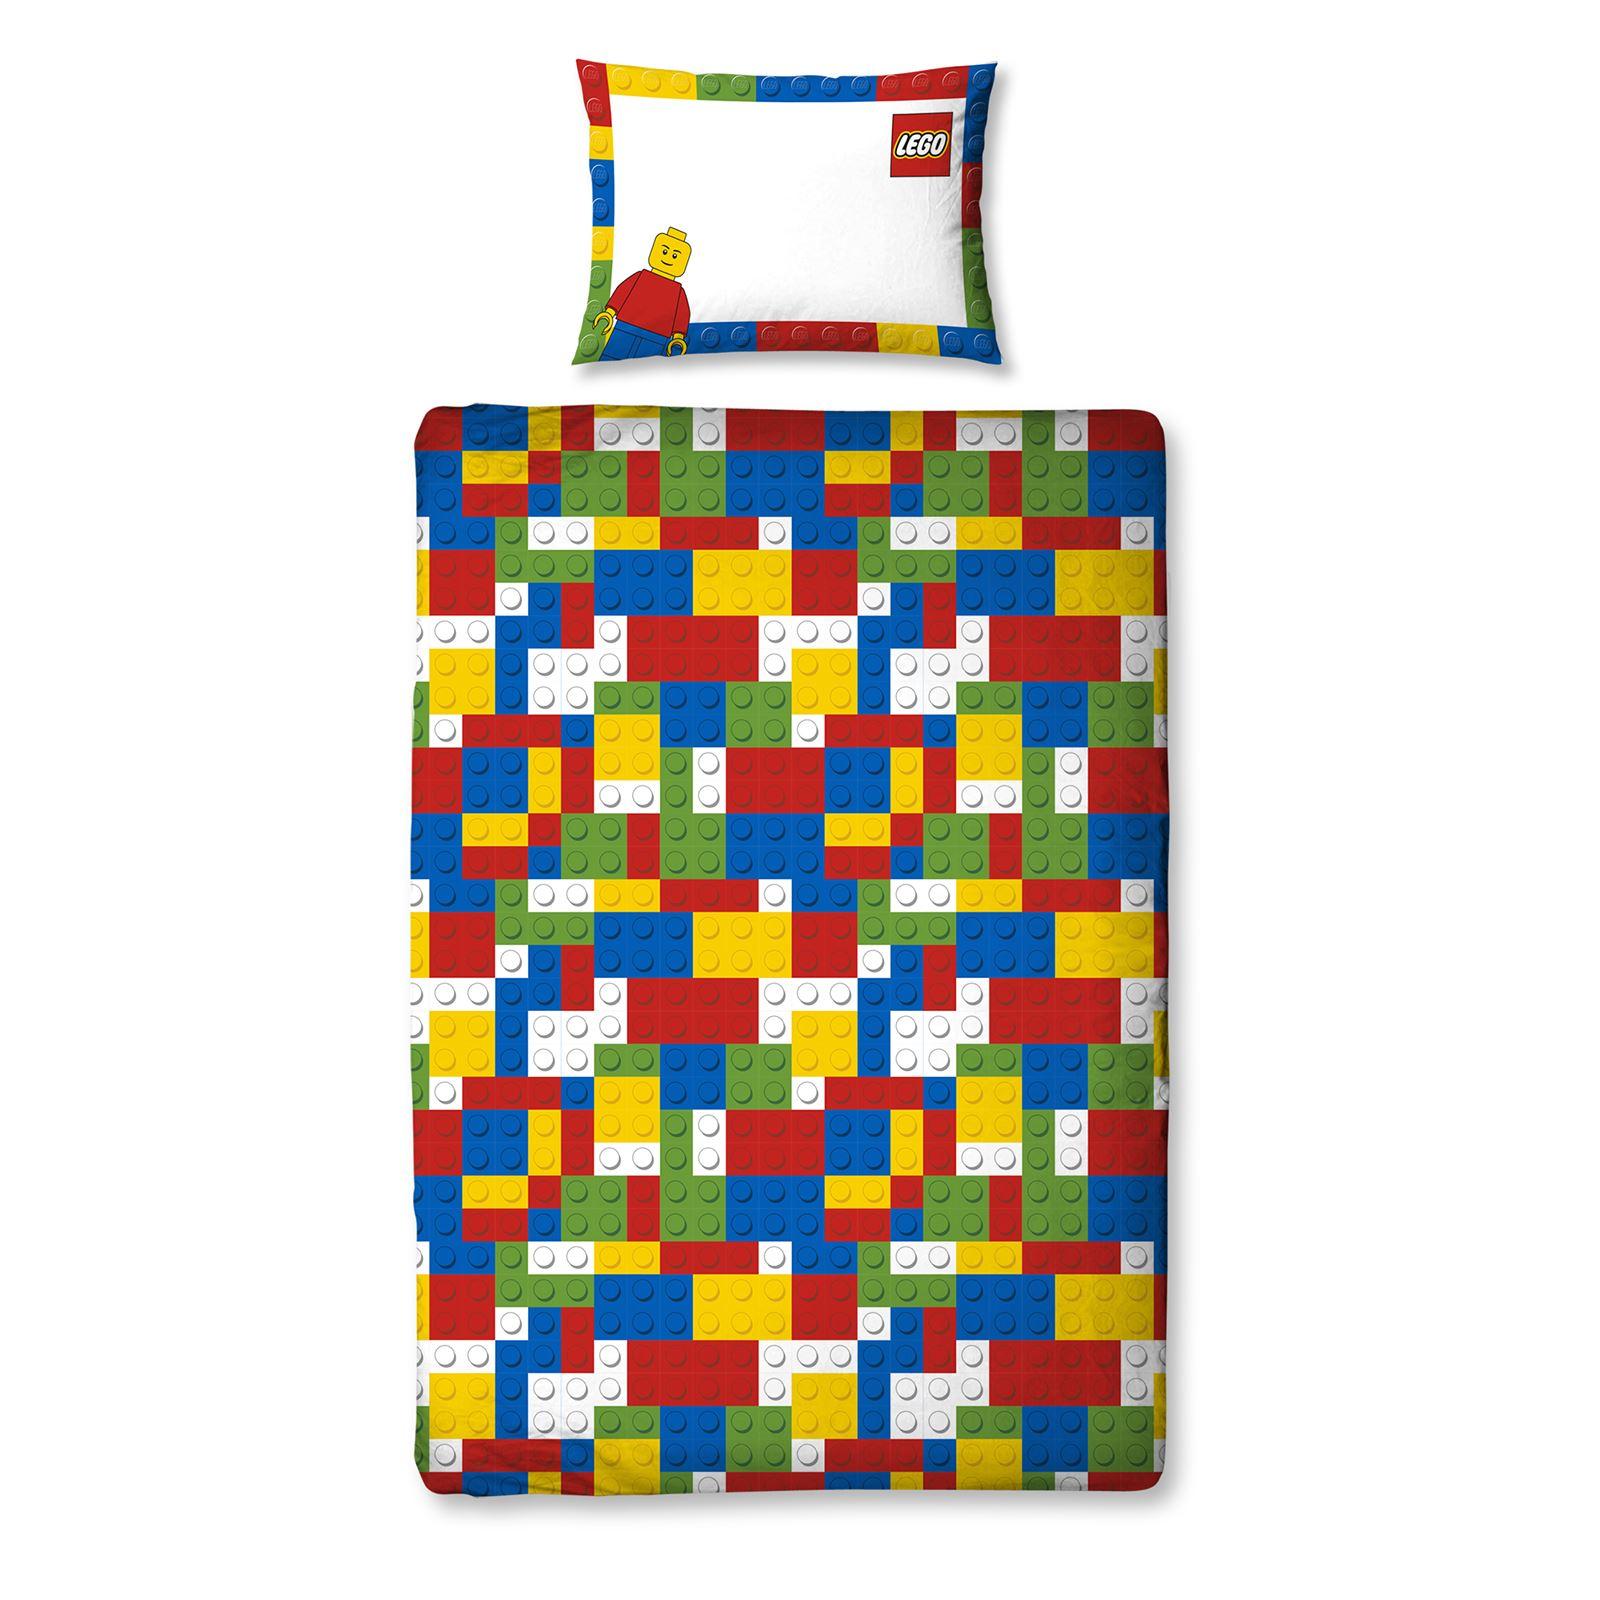 Lego Classic Minifigures Single Duvet Cover Set Panel